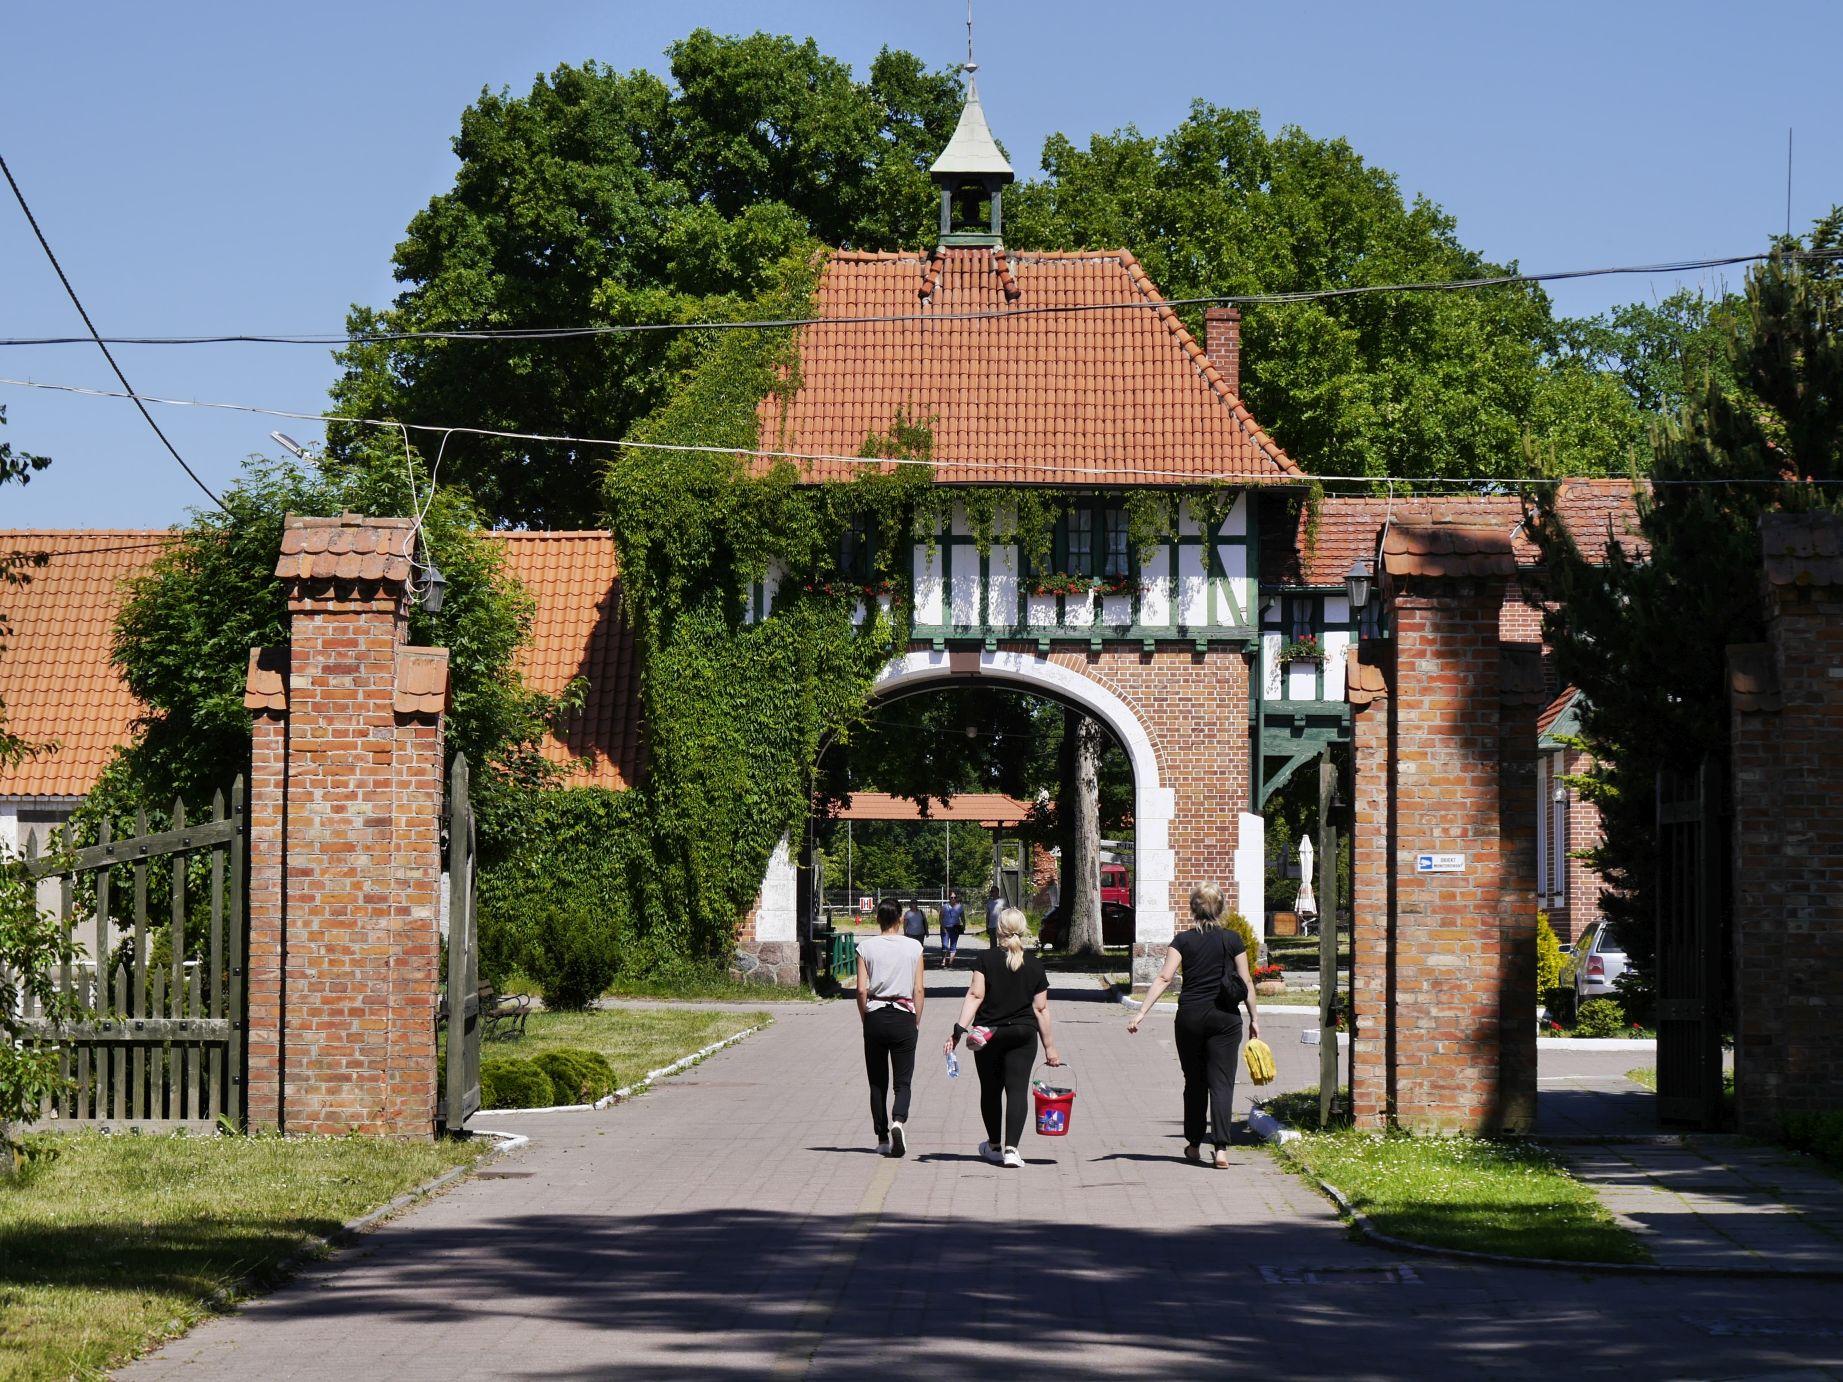 Eingang zum ehemaligen Pferdegestüt in Cadinen (Kadyny)